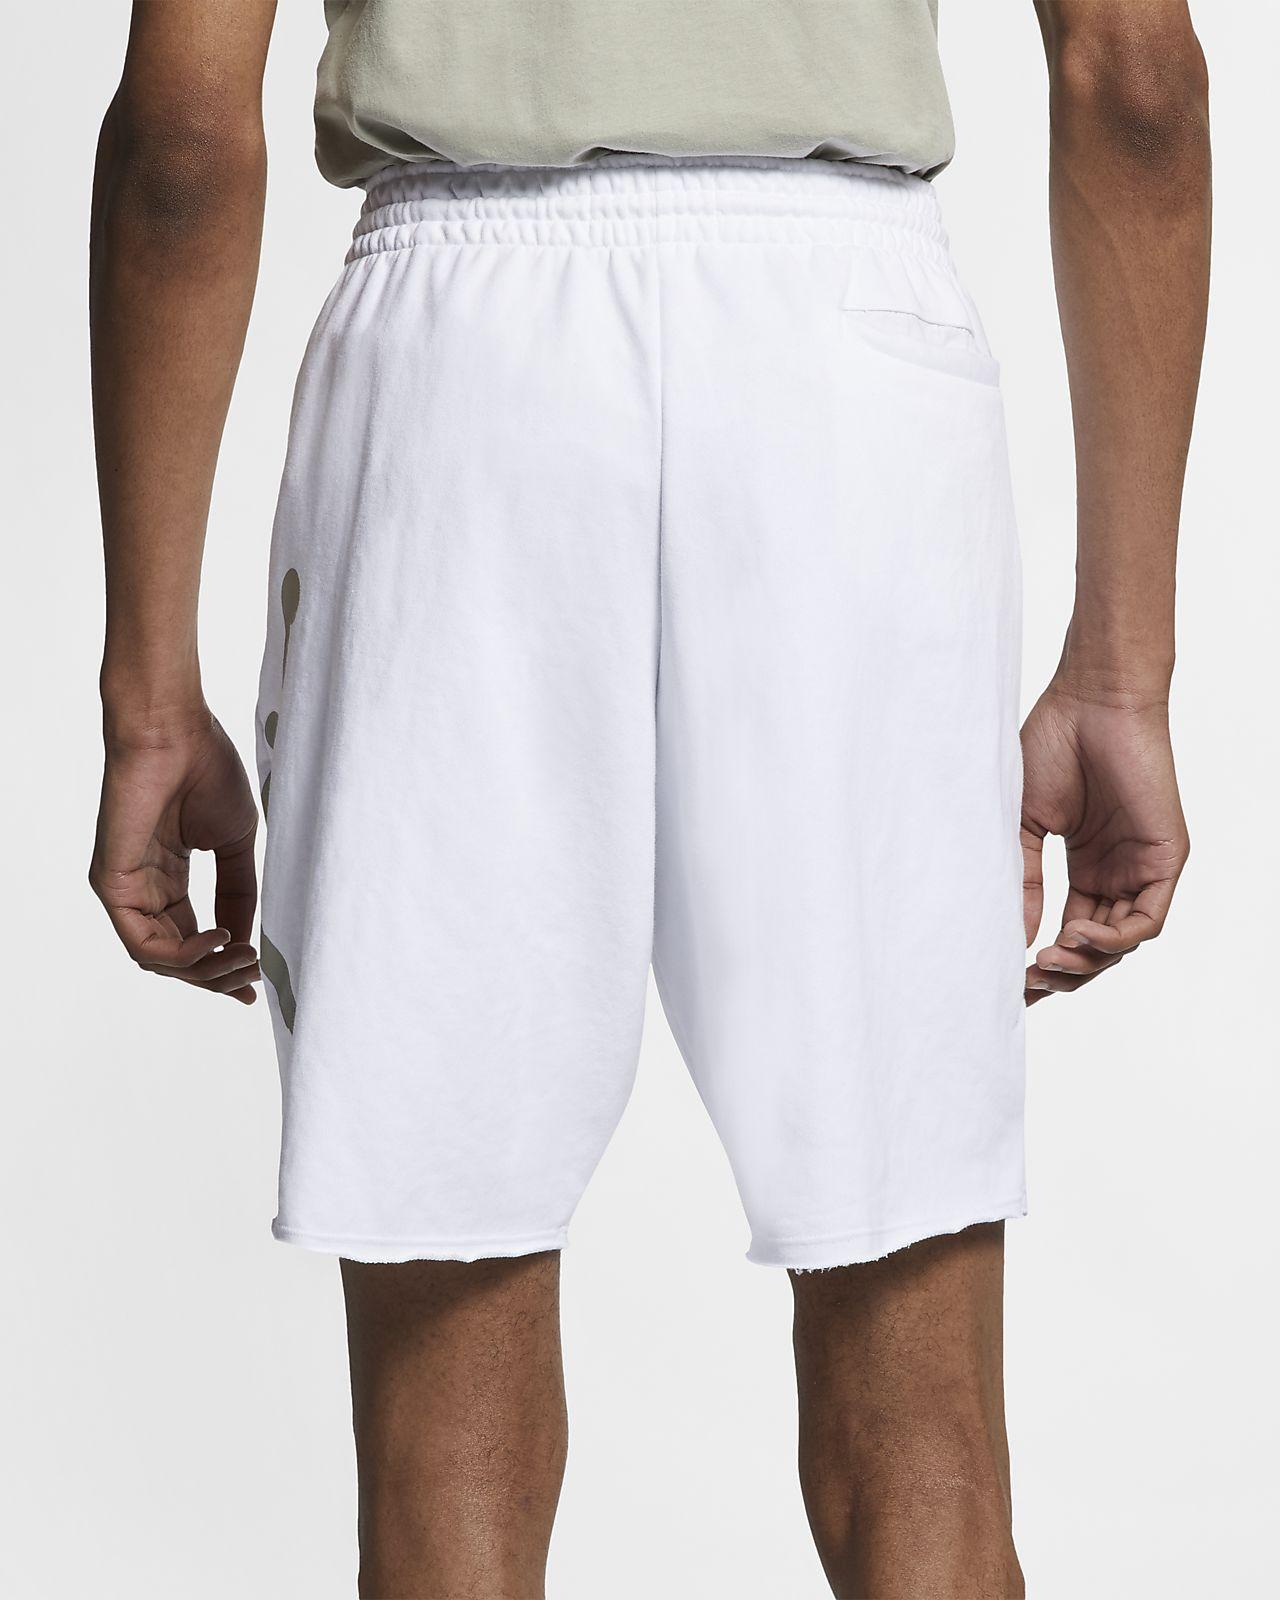 49ce9f4f0838 Jordan Jumpman Logo Men s Fleece Shorts. Nike.com